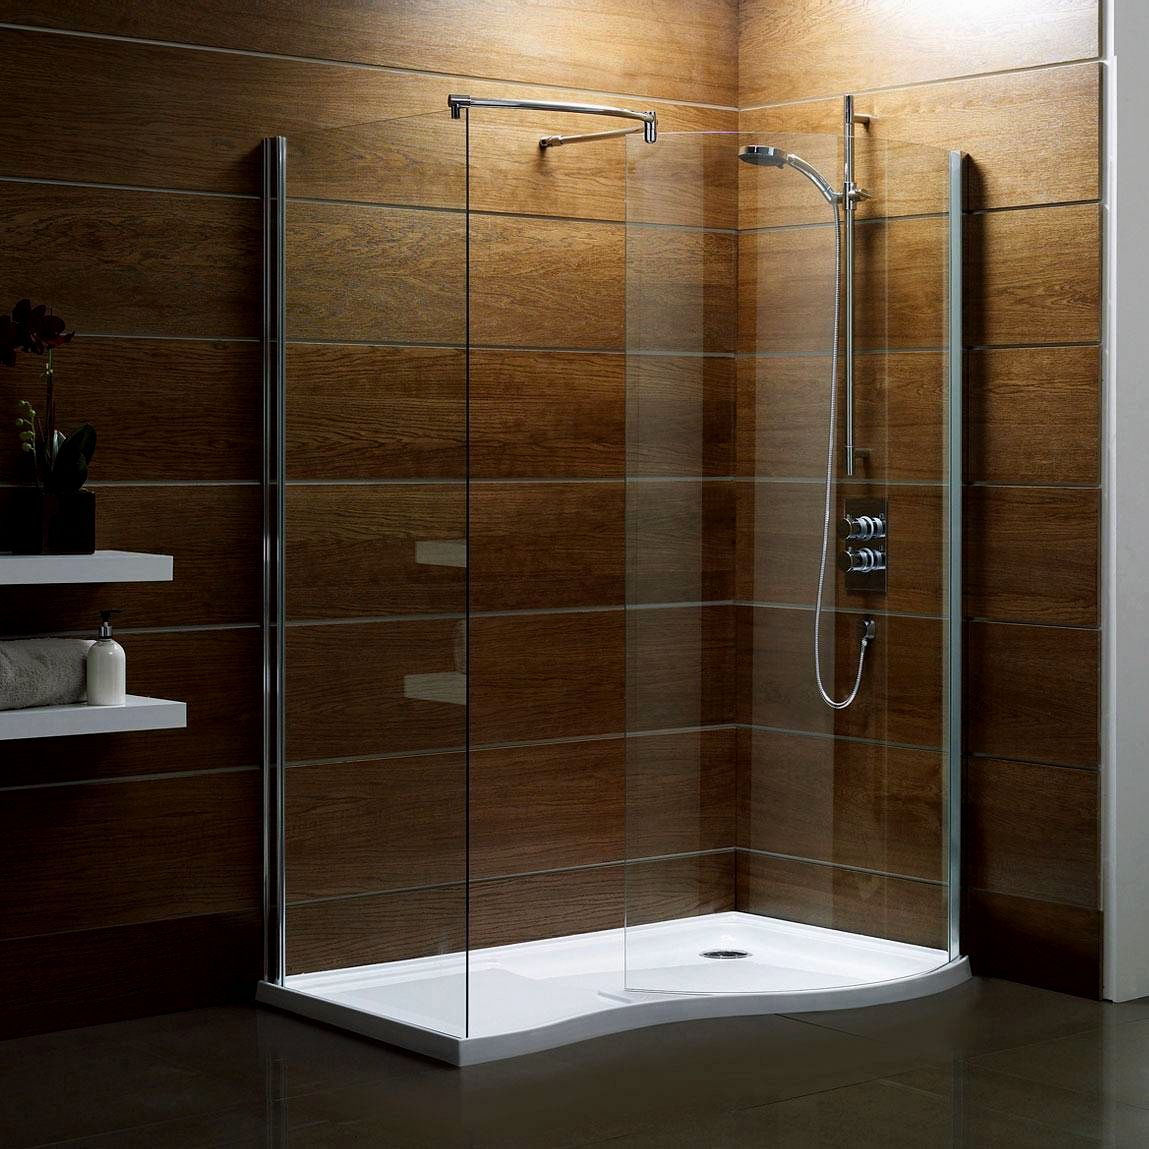 terrific bathroom shower tile ideas design-Amazing Bathroom Shower Tile Ideas Photo